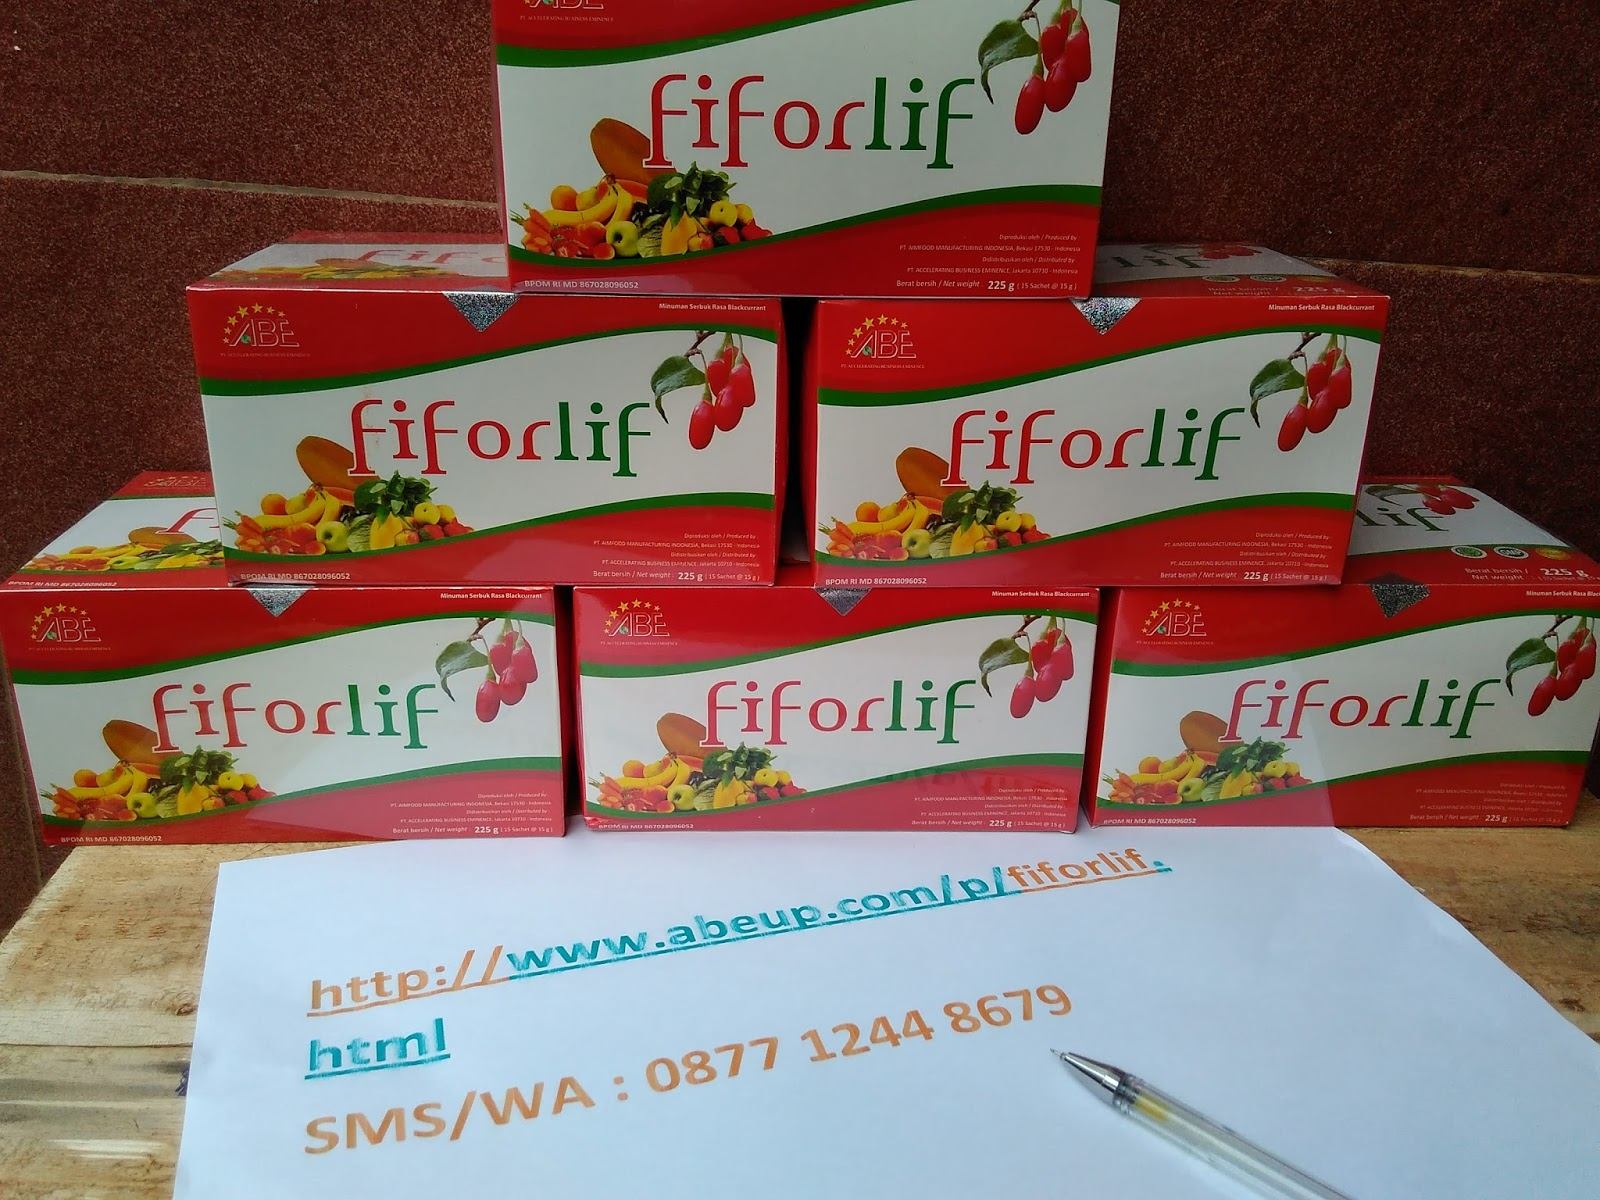 Fiforlif Detox Paket 1 Bulan 4 Box Update Harga Terkini Dan Ekonomis Bonus Shacker Untuk Melancarkan Bab Turunkan Berat Badan Maag Ambien Sebelum Membeli Produk Jus Super Serat